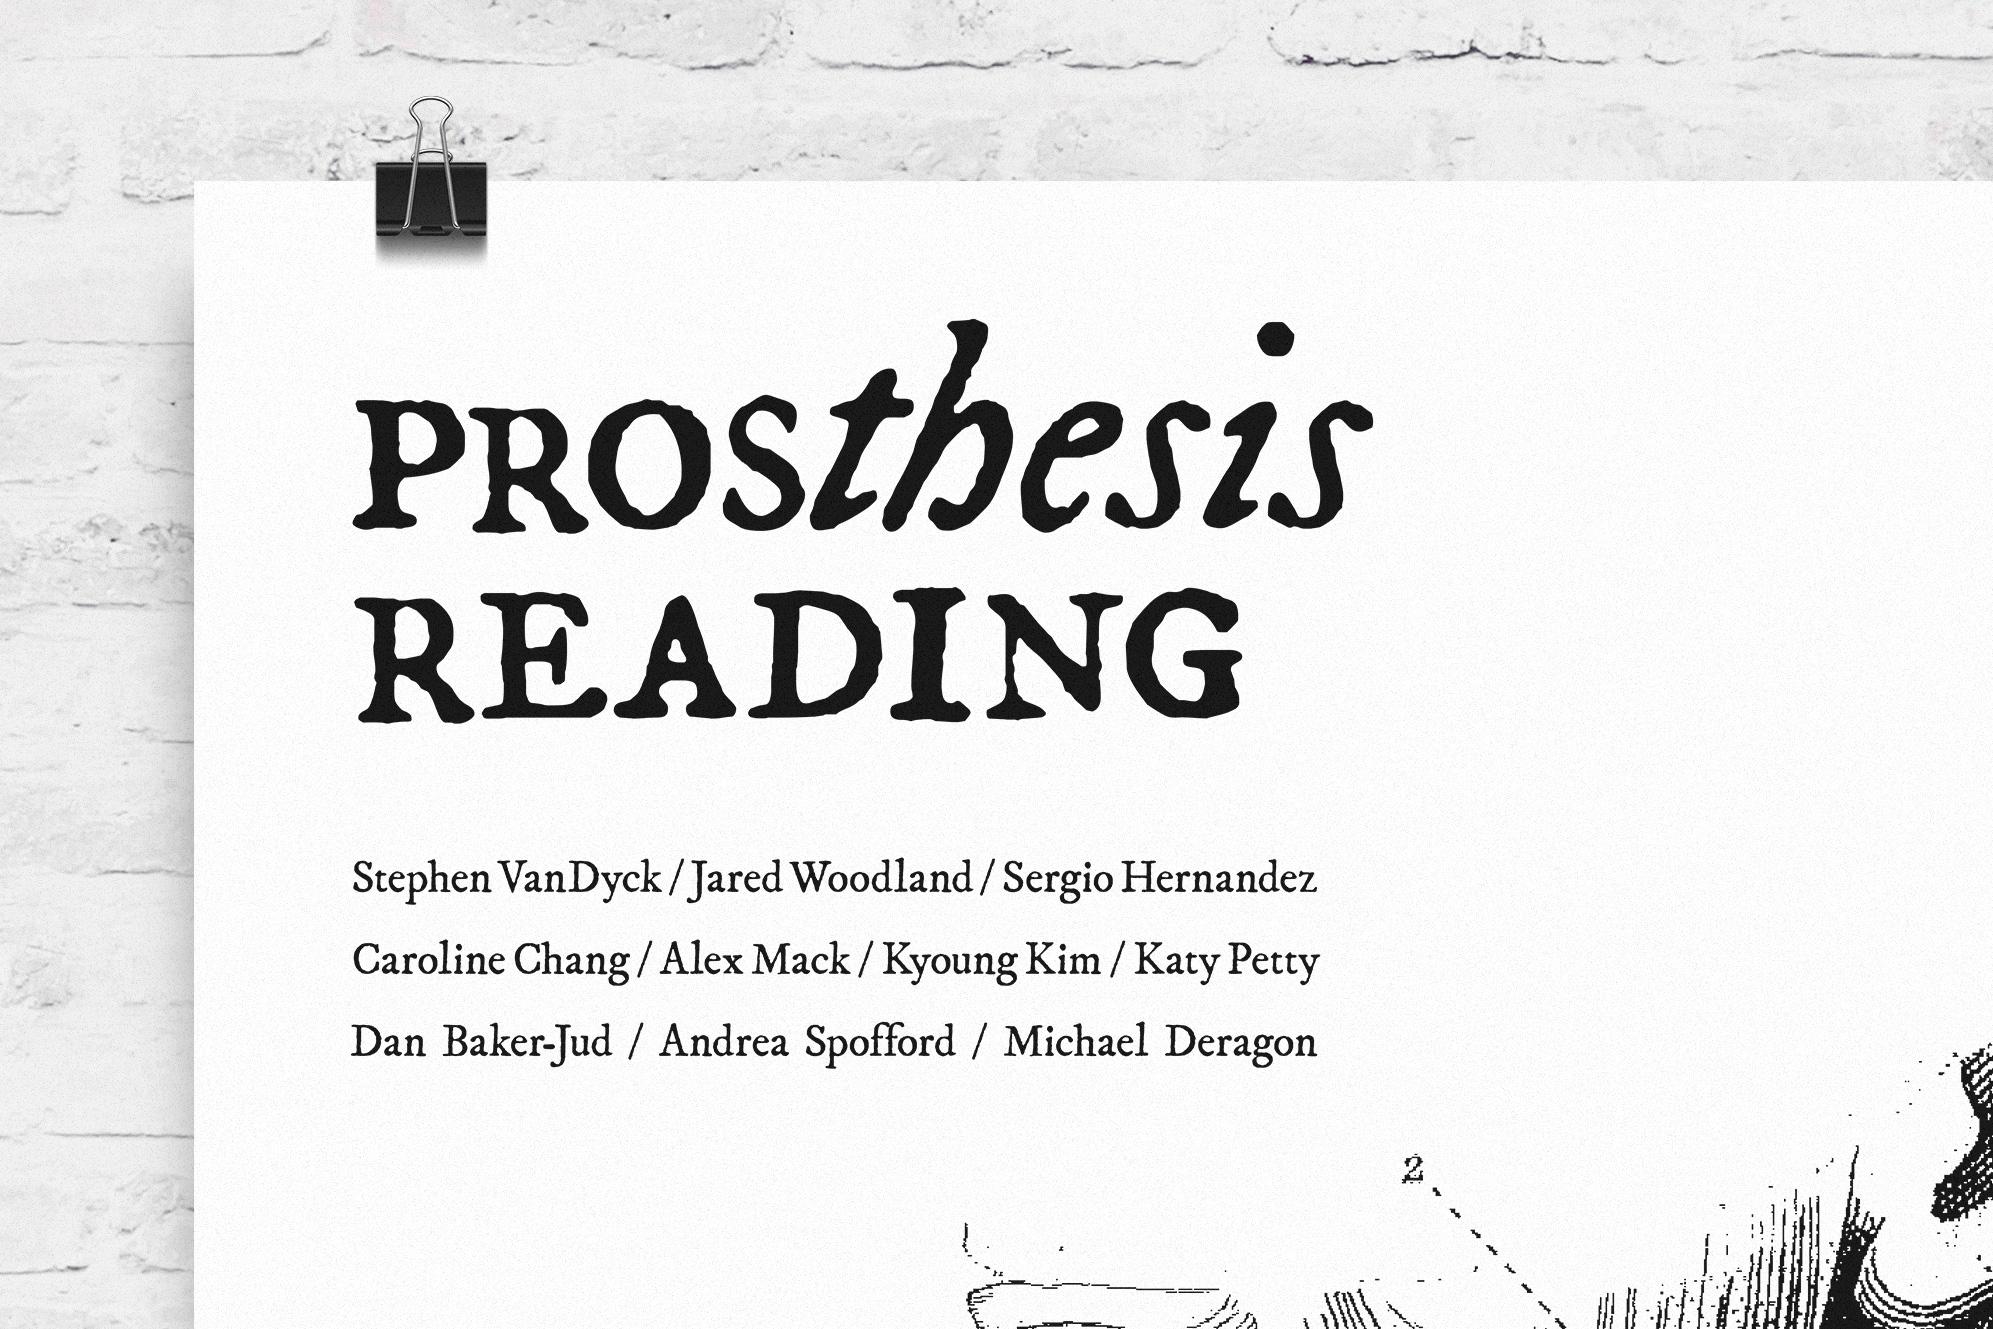 prosthesis_2x3_15.jpg